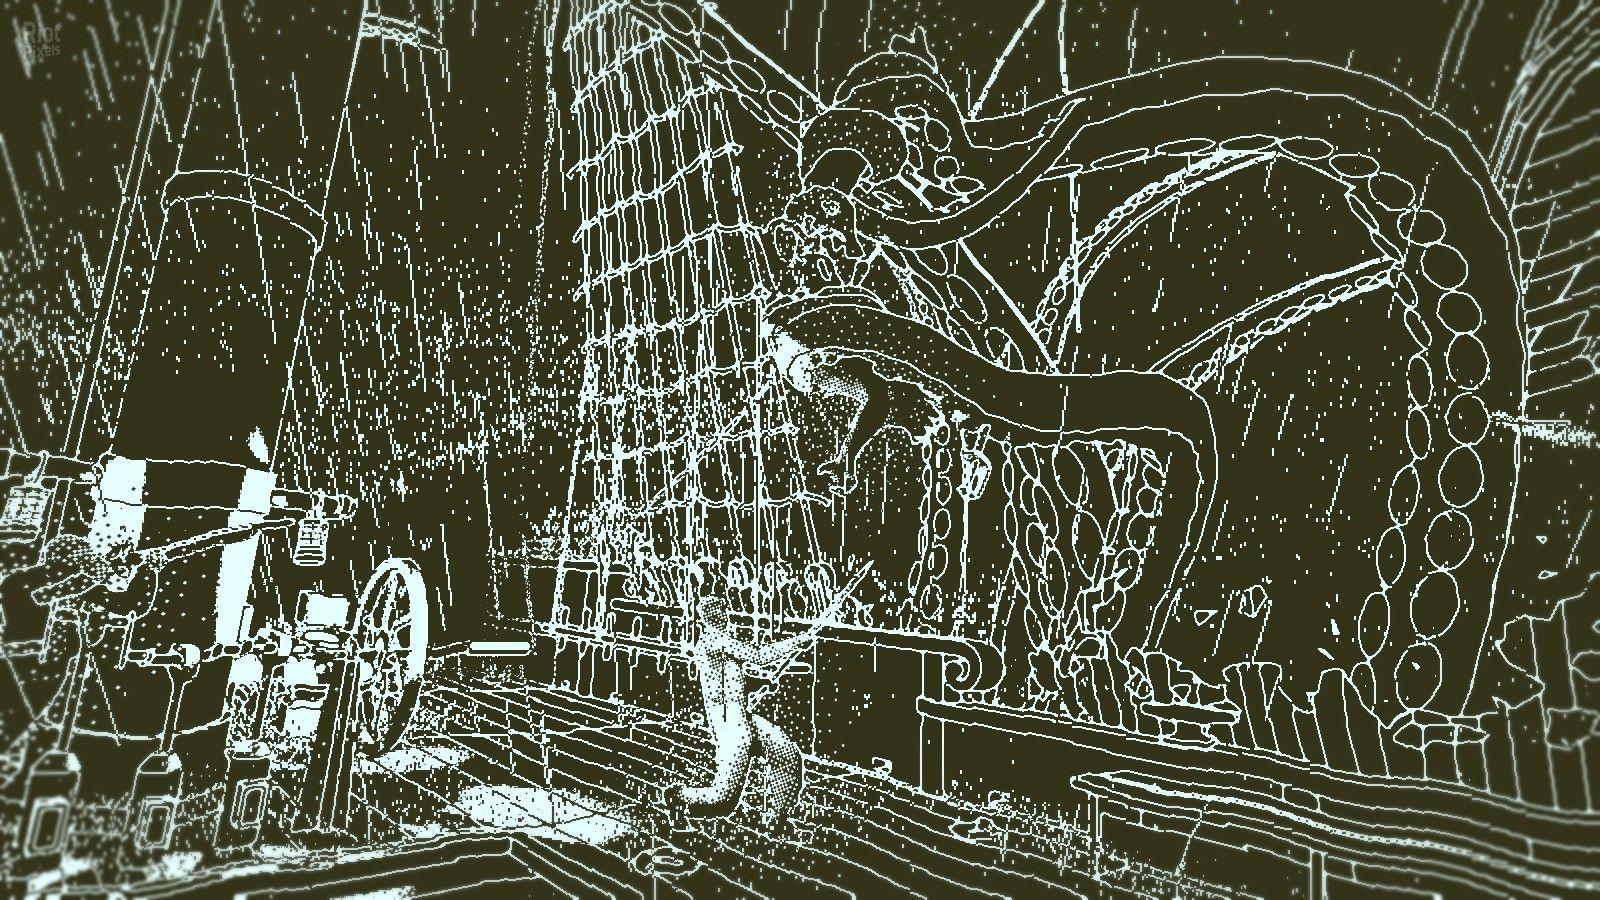 Return Of The Obra Dinn Wallpapers - Wallpaper Cave